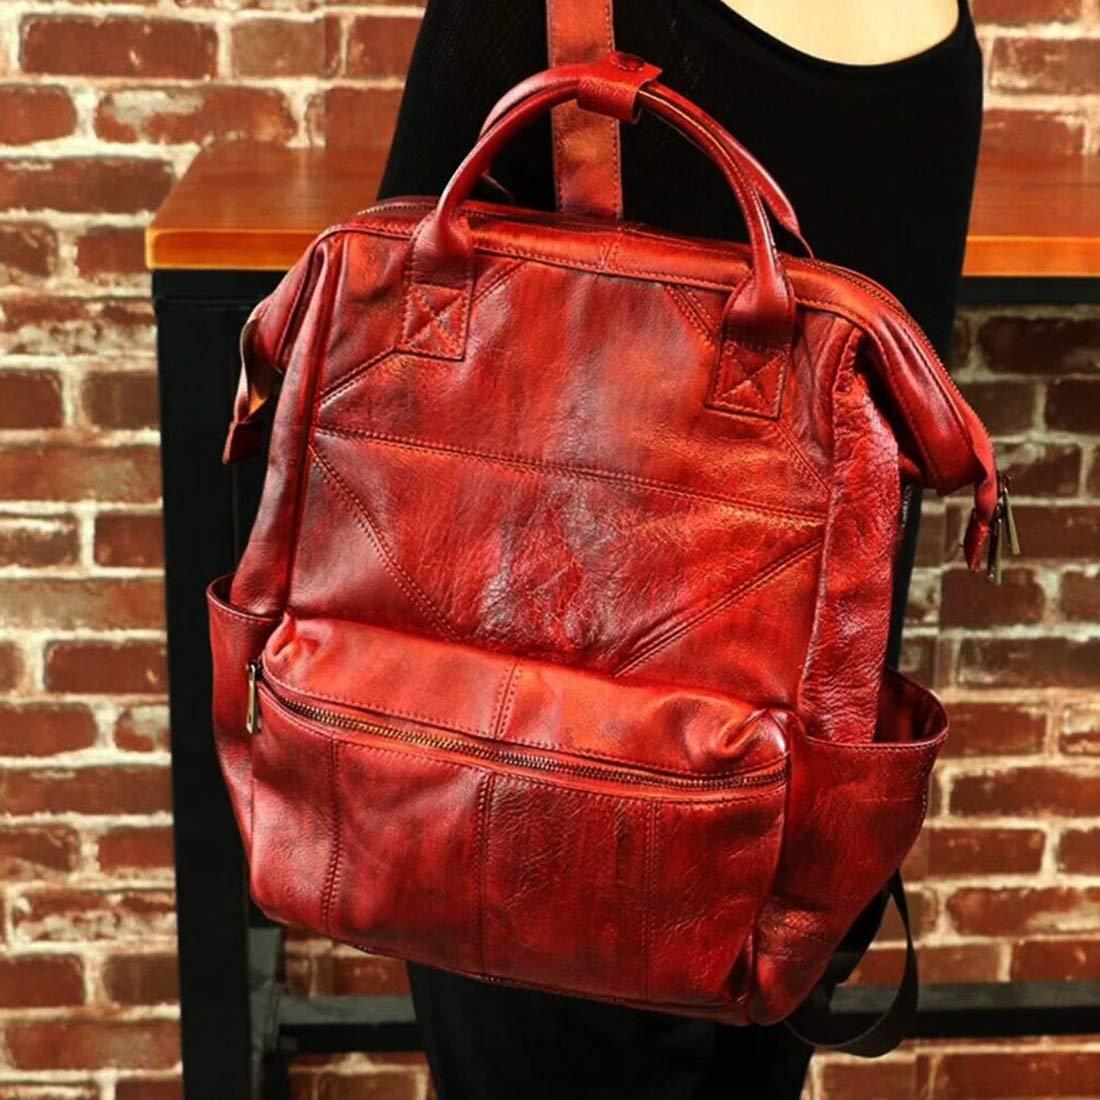 Vergeania 本革のバックパック牛革バックパック高校生の女の子軽量大容量バッグメッセンジャーバッグ (色 : レッド) B07S1D9H5H レッド